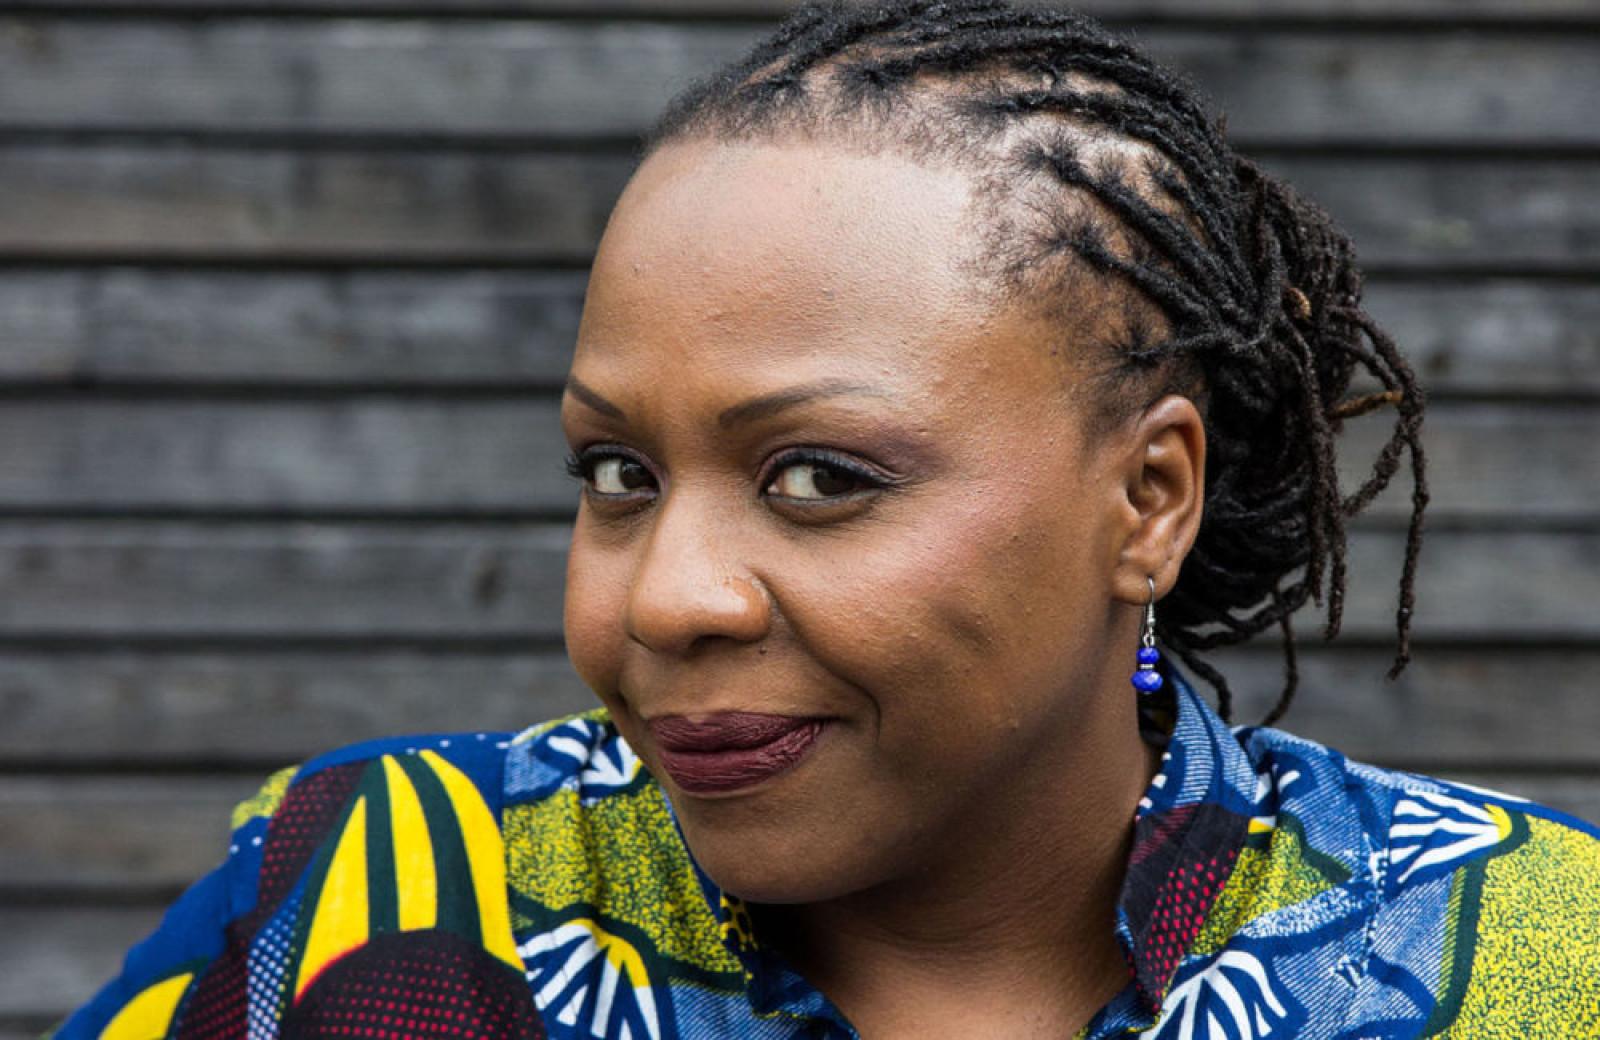 I sold undergarments in Ibadan for two years – Lola Shoneyin